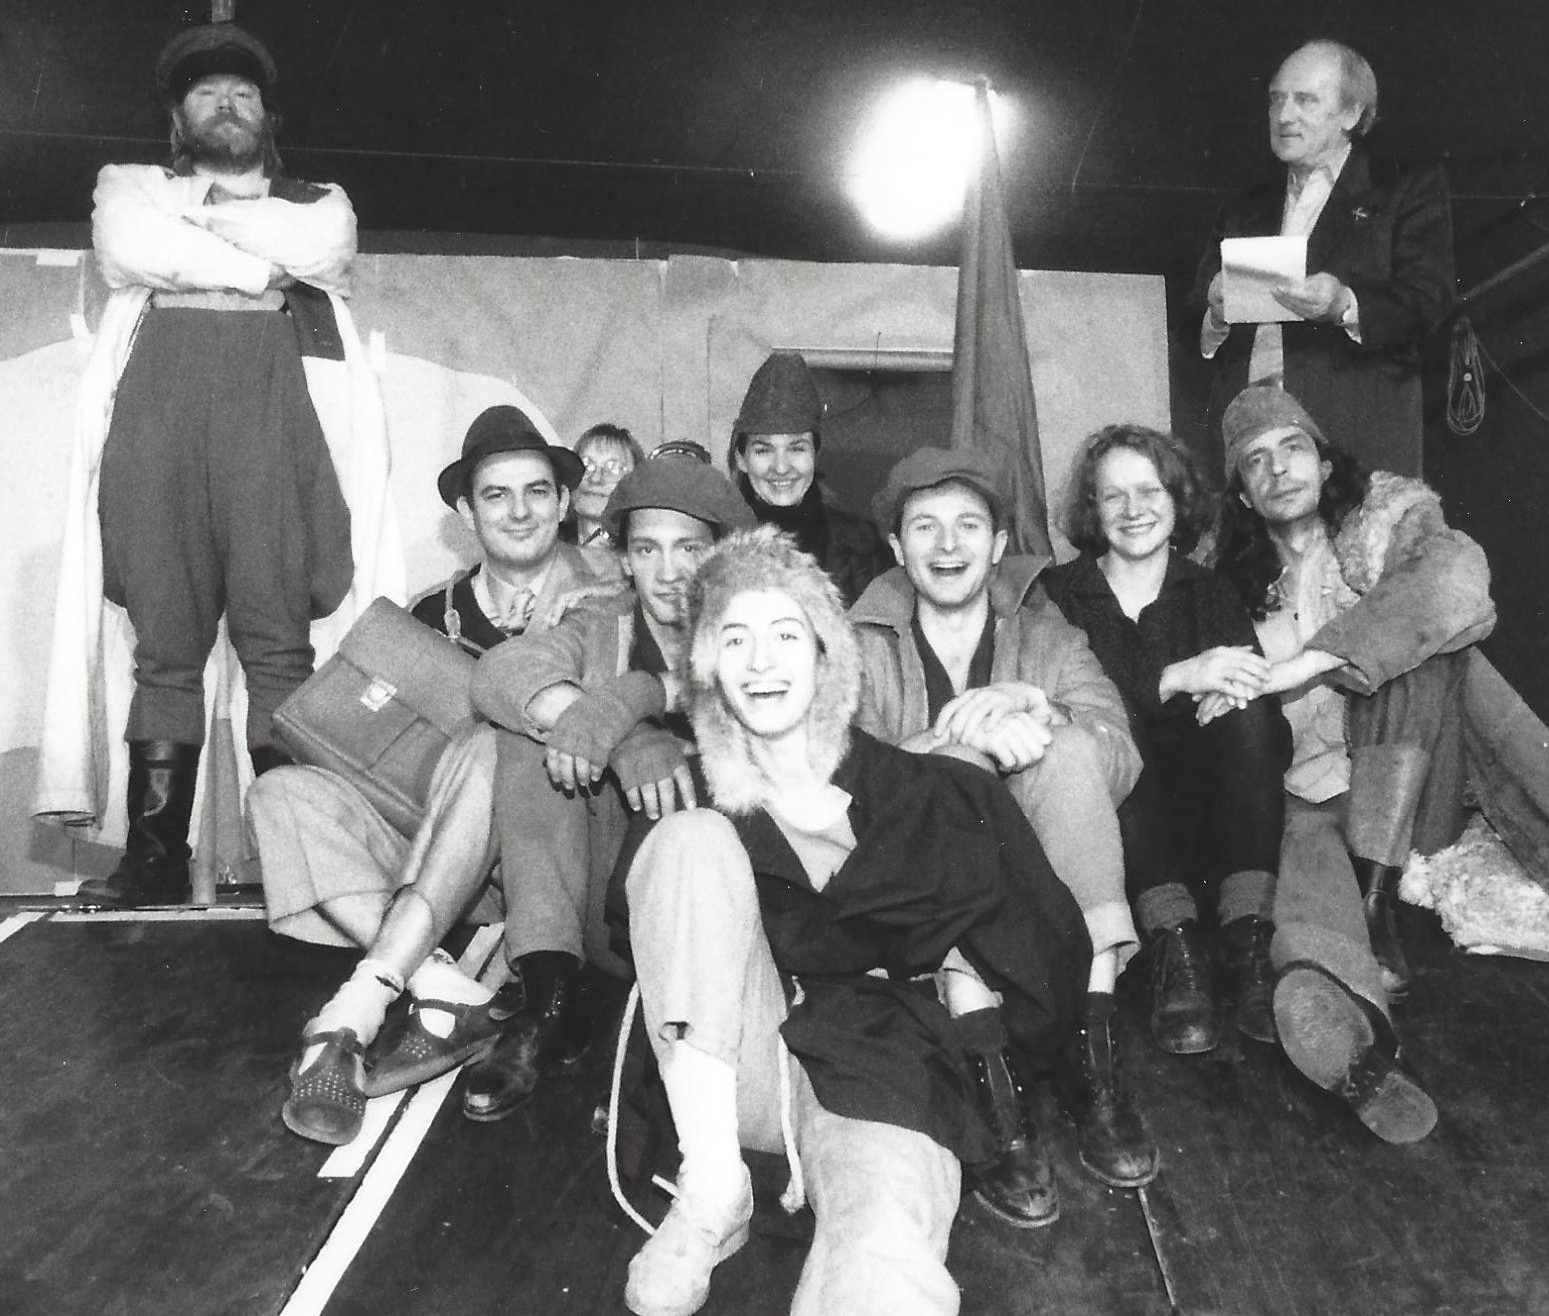 mit Rainer Müller, Holger Hübner, Martina Hansky (Akkordeon), Philipp Otto, Wicki Kalaitzi, Heike Pfeiffer, J.T., Henriette Cejpek, Robert Wittmers